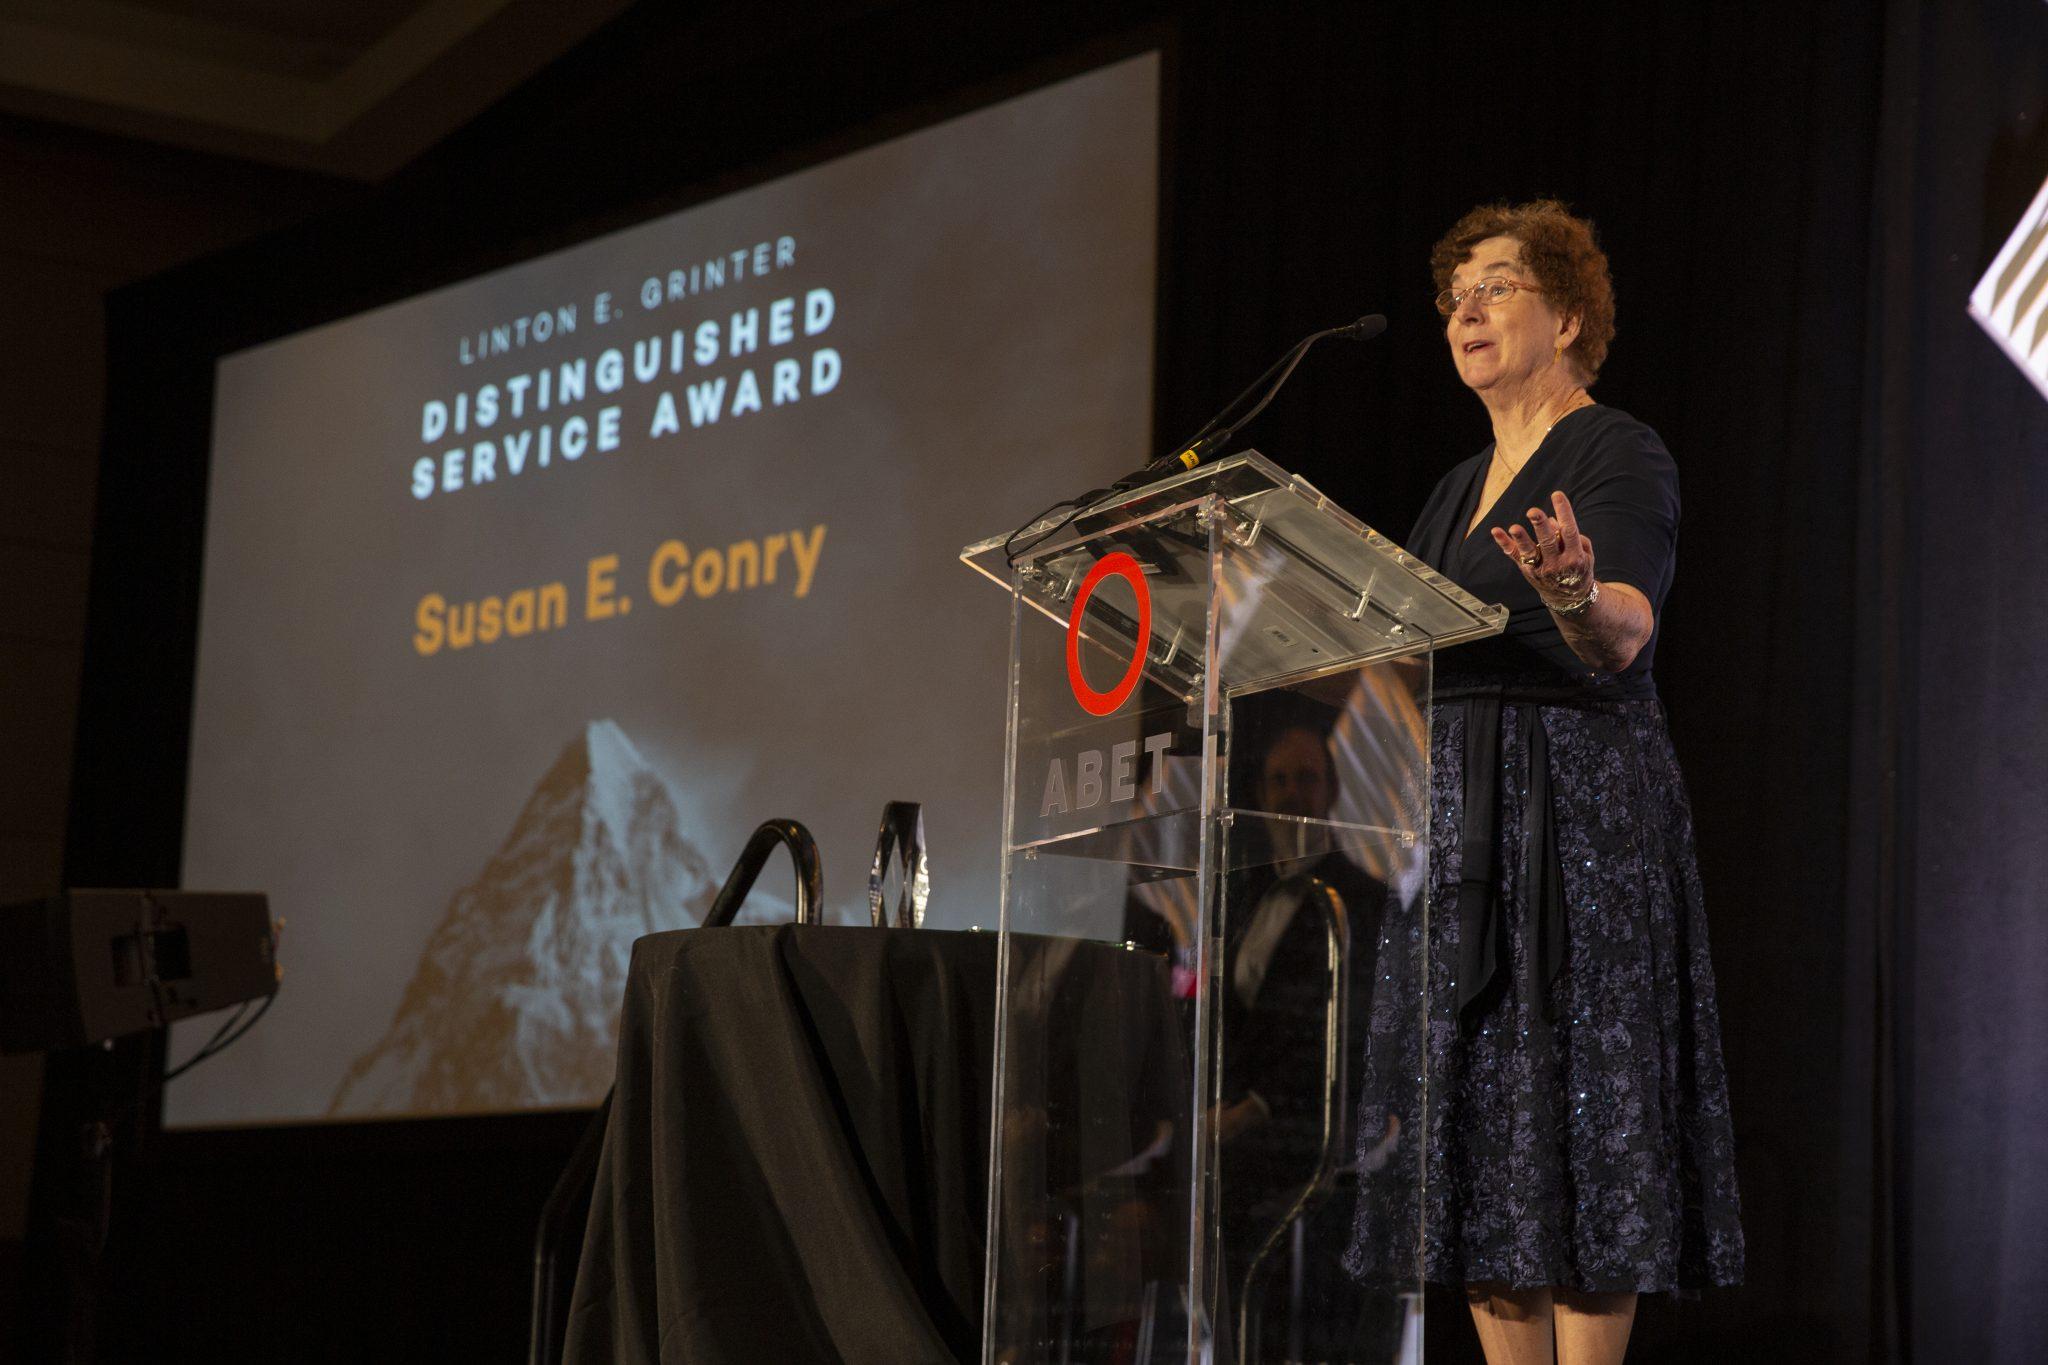 Susan E. Conry, recipient of the 2019 Linton E. Grinter Distinguished Award.